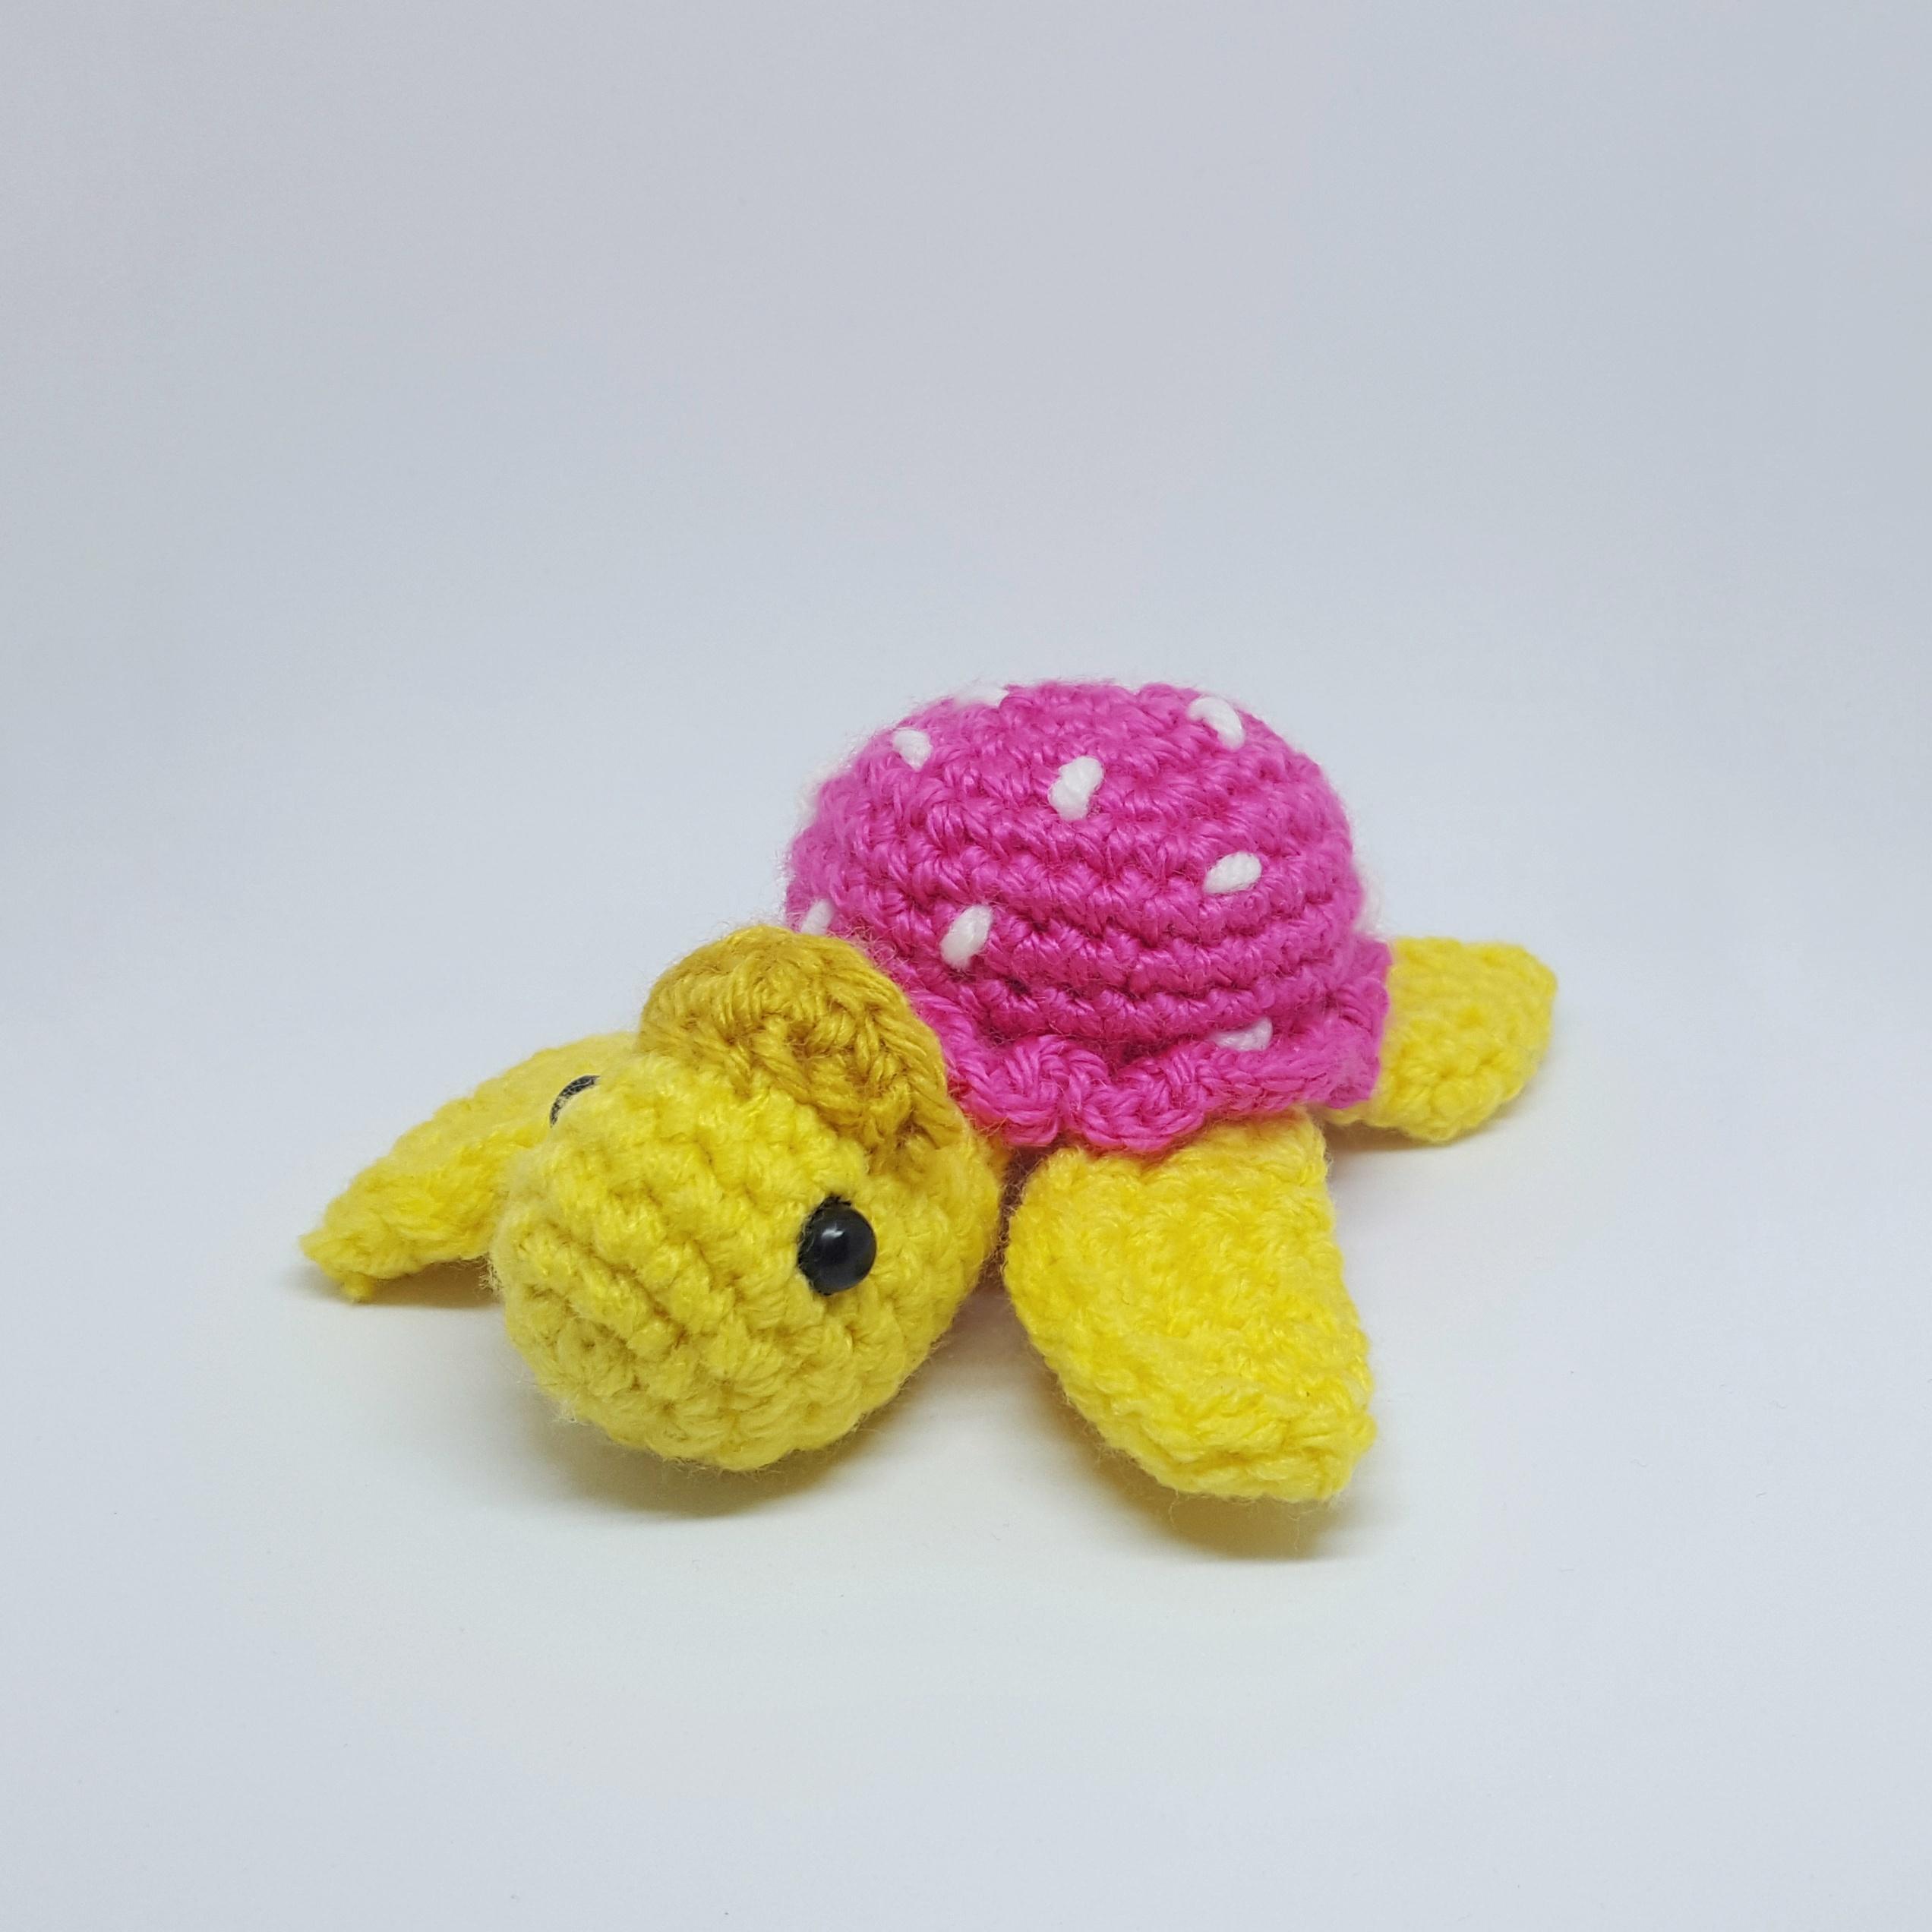 Amigurumi - all FREE Crochet Patterns at a Glance - doitory | Page 5 | 2544x2544